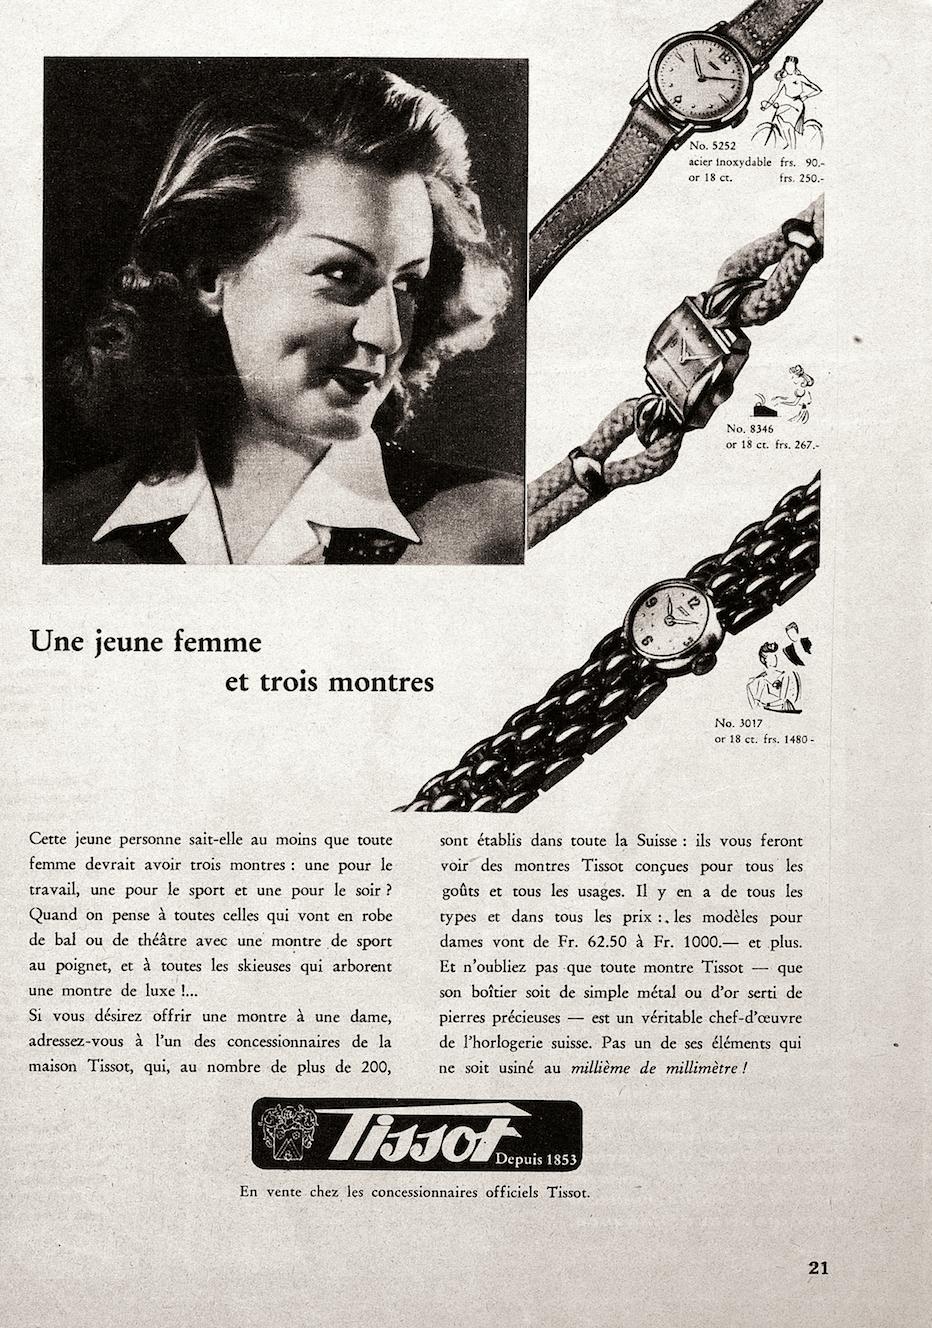 Las mujeres Tissot